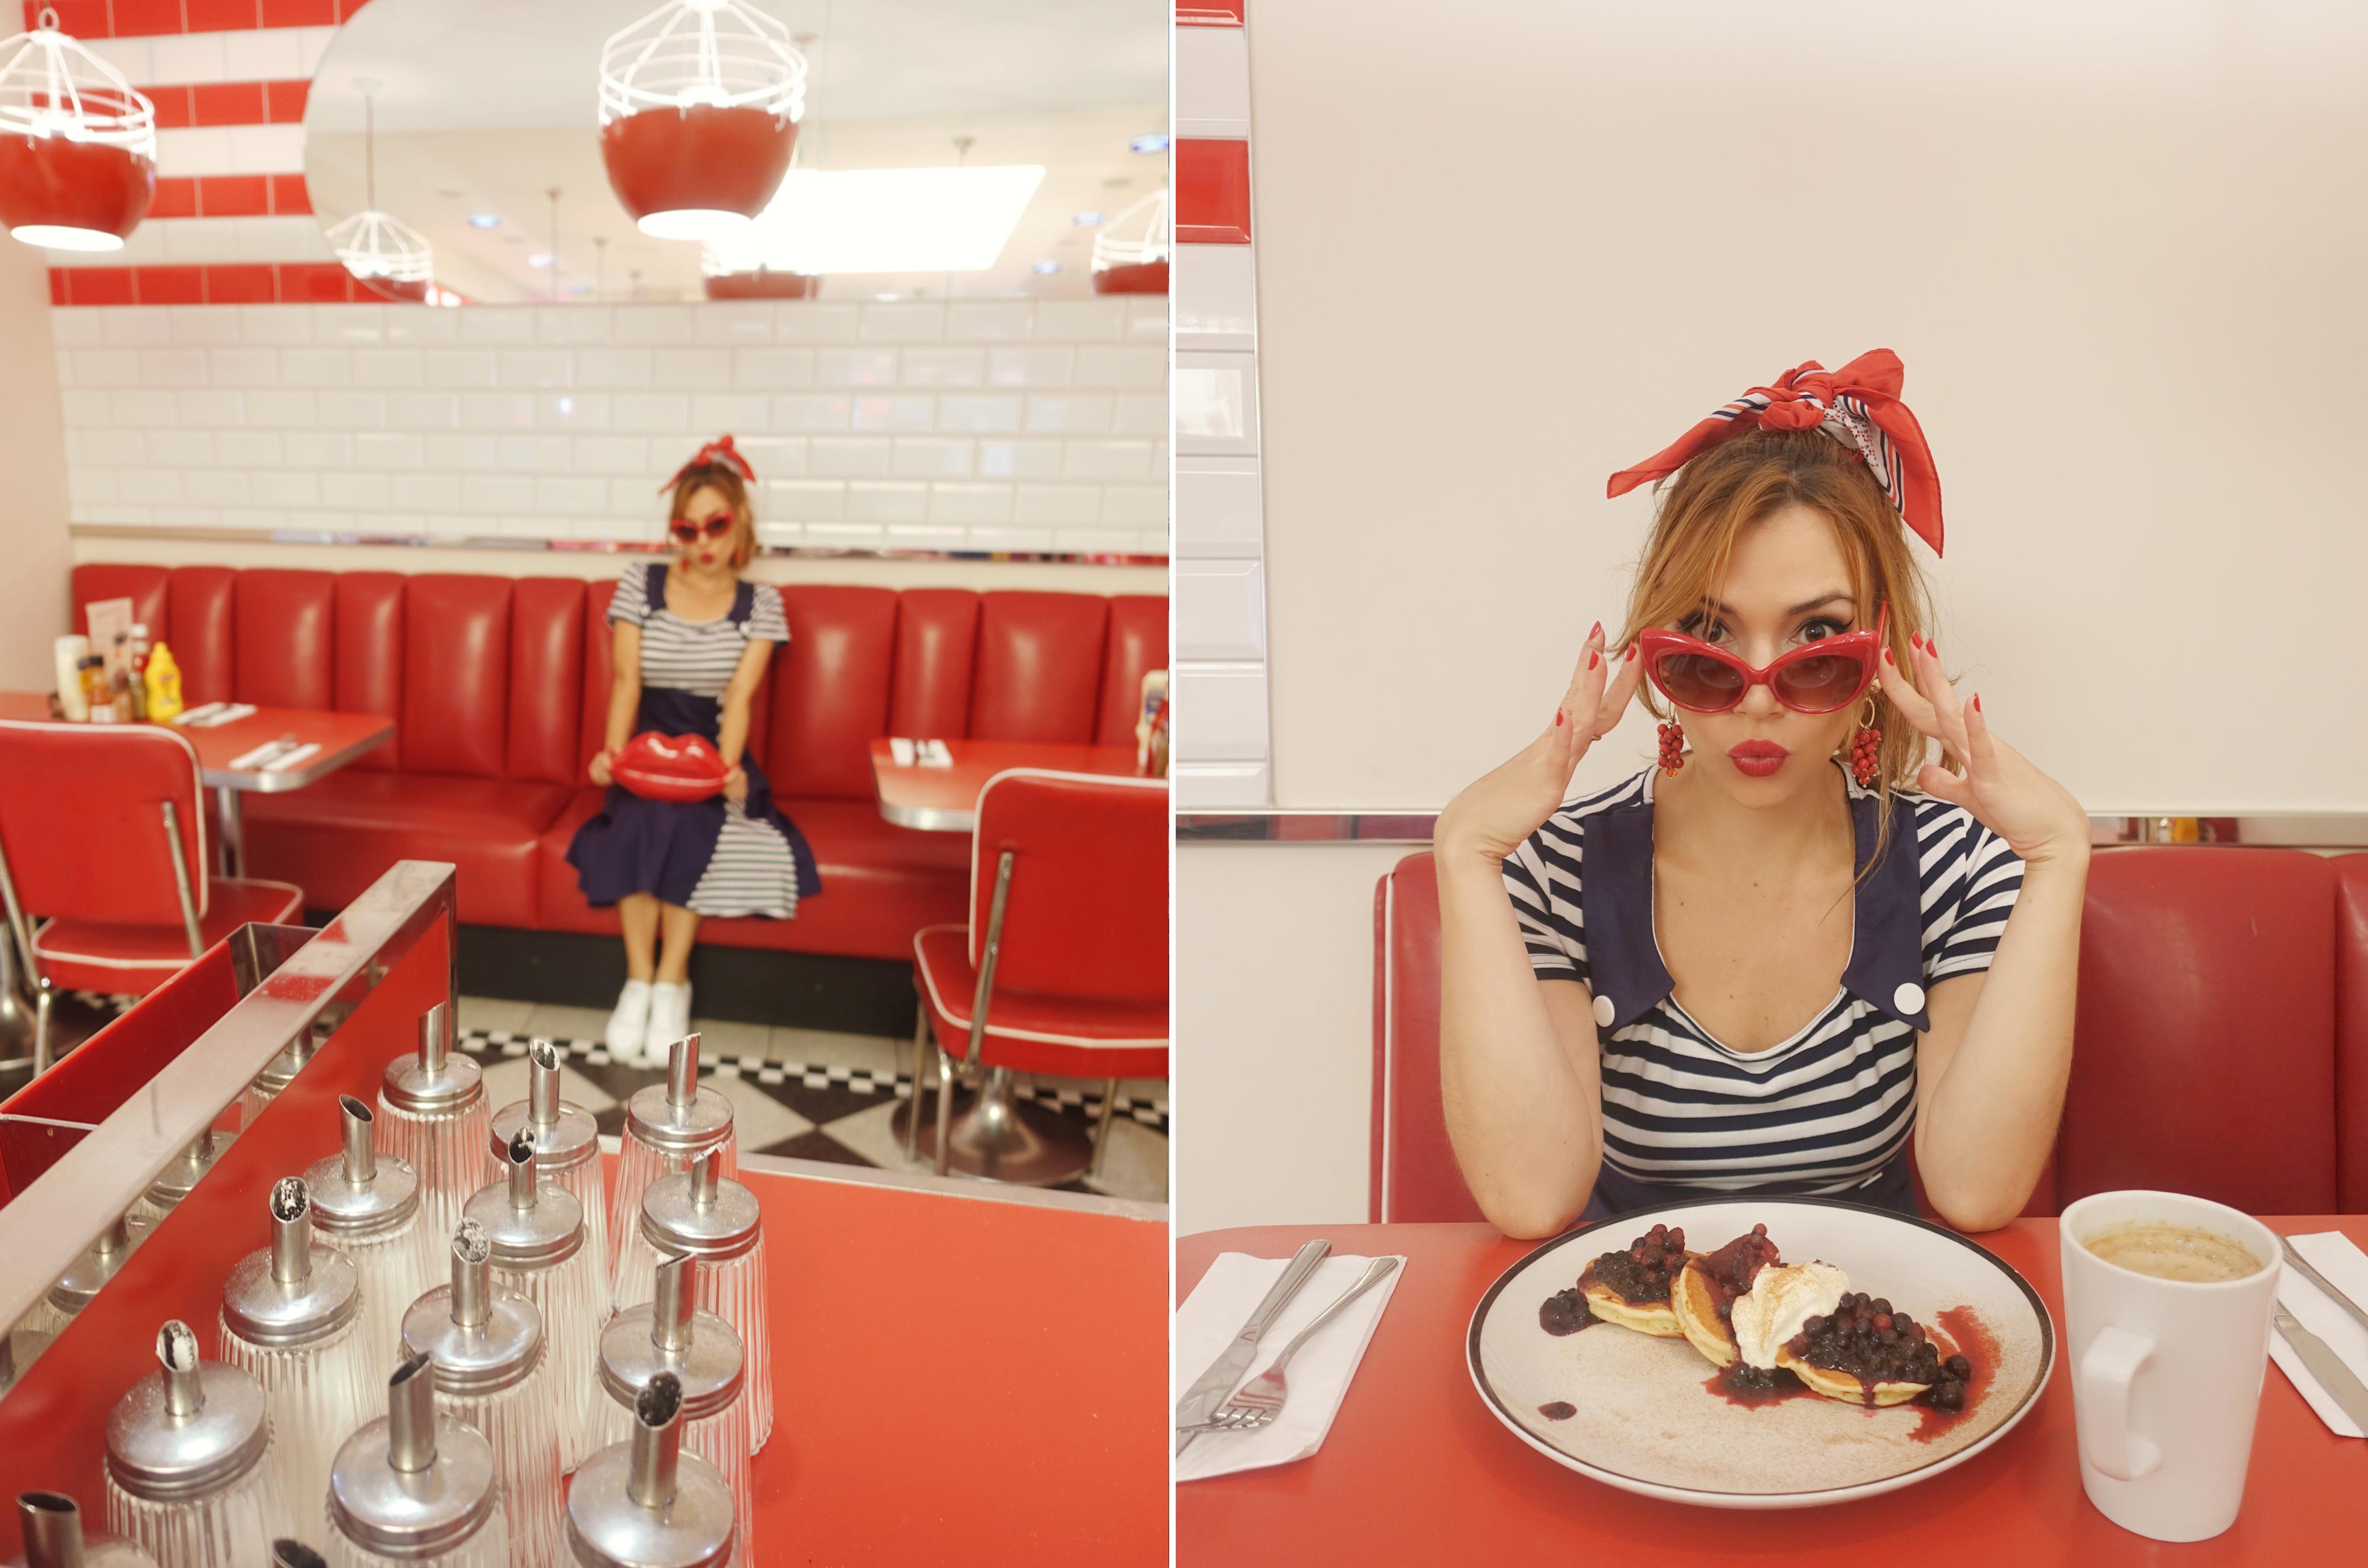 floryday-dresses-PiensaenChic-blog-de-moda-Chicadicta-influencer-fashionista-outfit-retro-Ed's-Easy-Diner-bolsos-de-besos-Chic-adicta-Piensa-en-Chic